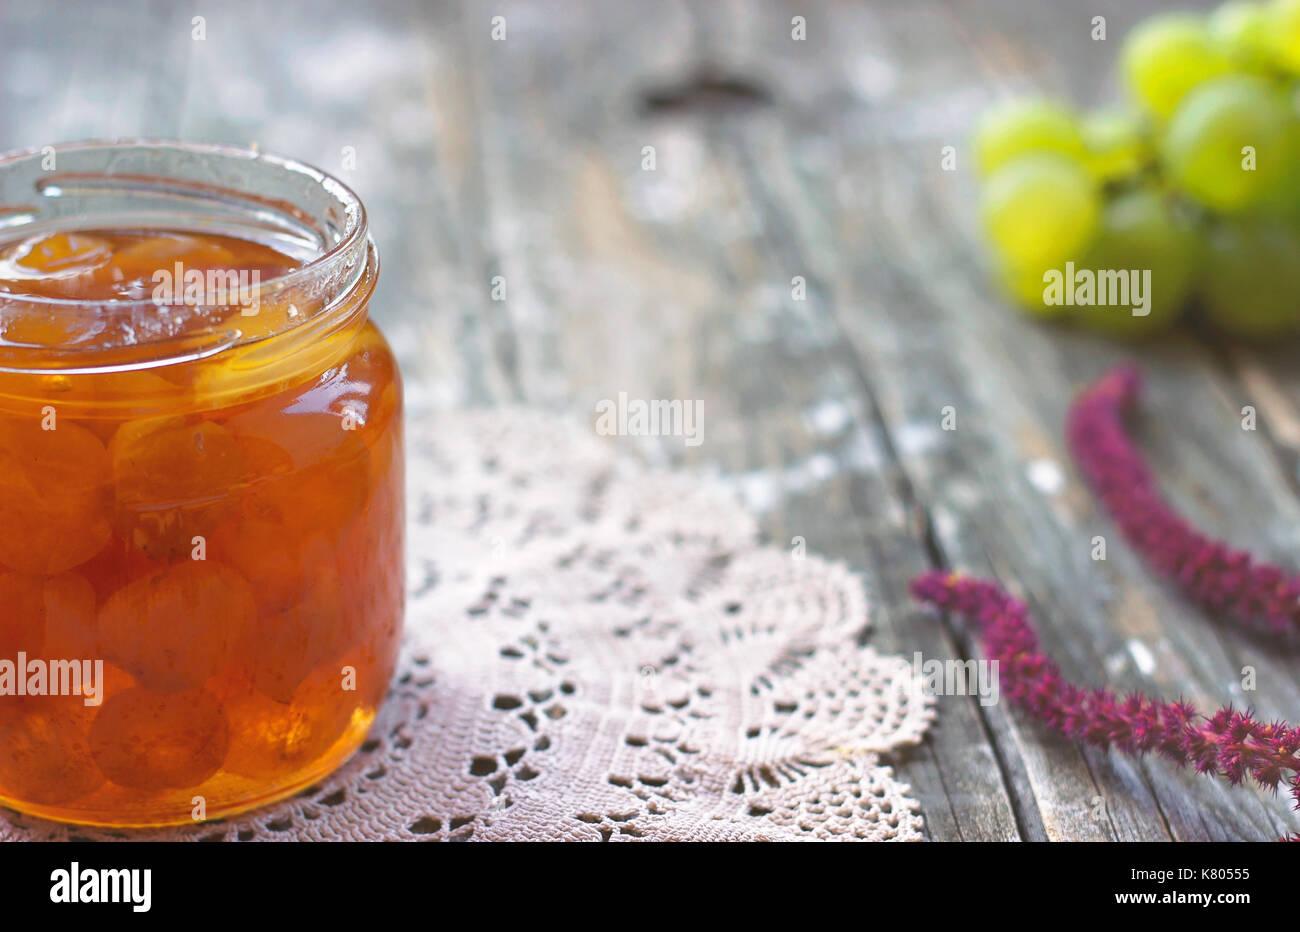 Slatko - preserved white grapes in glass jar, on wooden background; traditional serbian desert of white grapes or white cherries - Stock Image